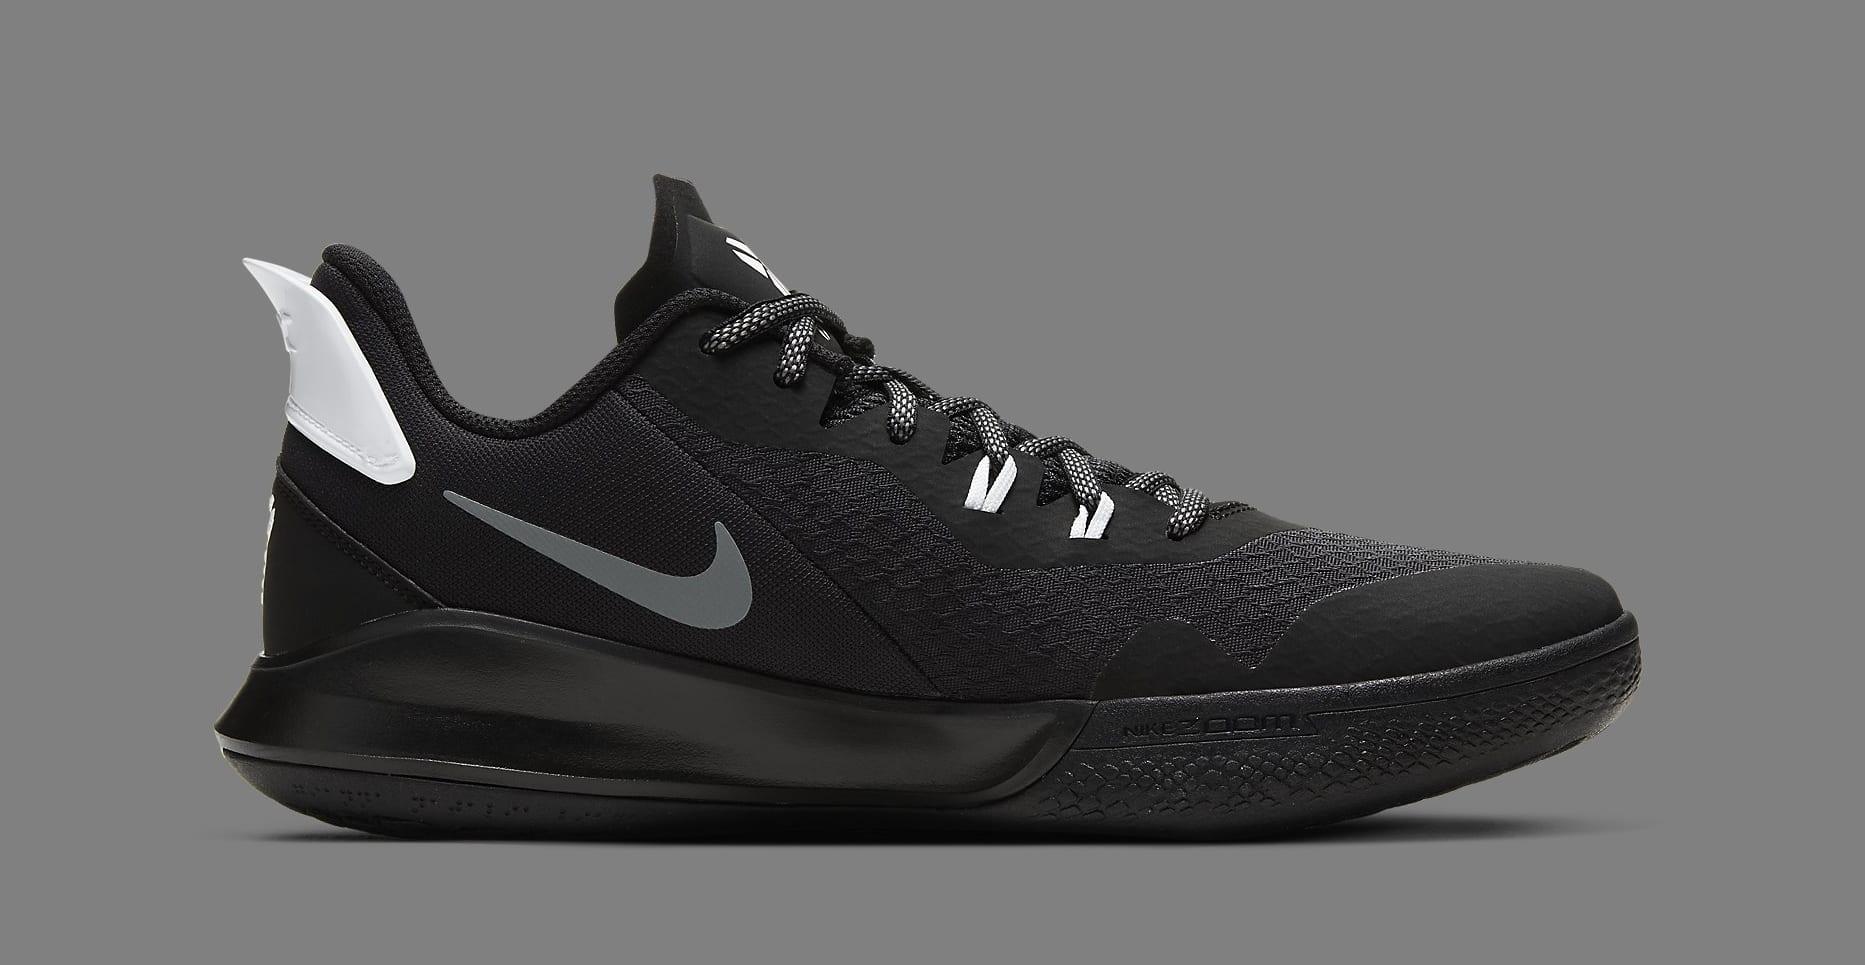 Nike Kobe Mamba Fury CK2087-001 Medial